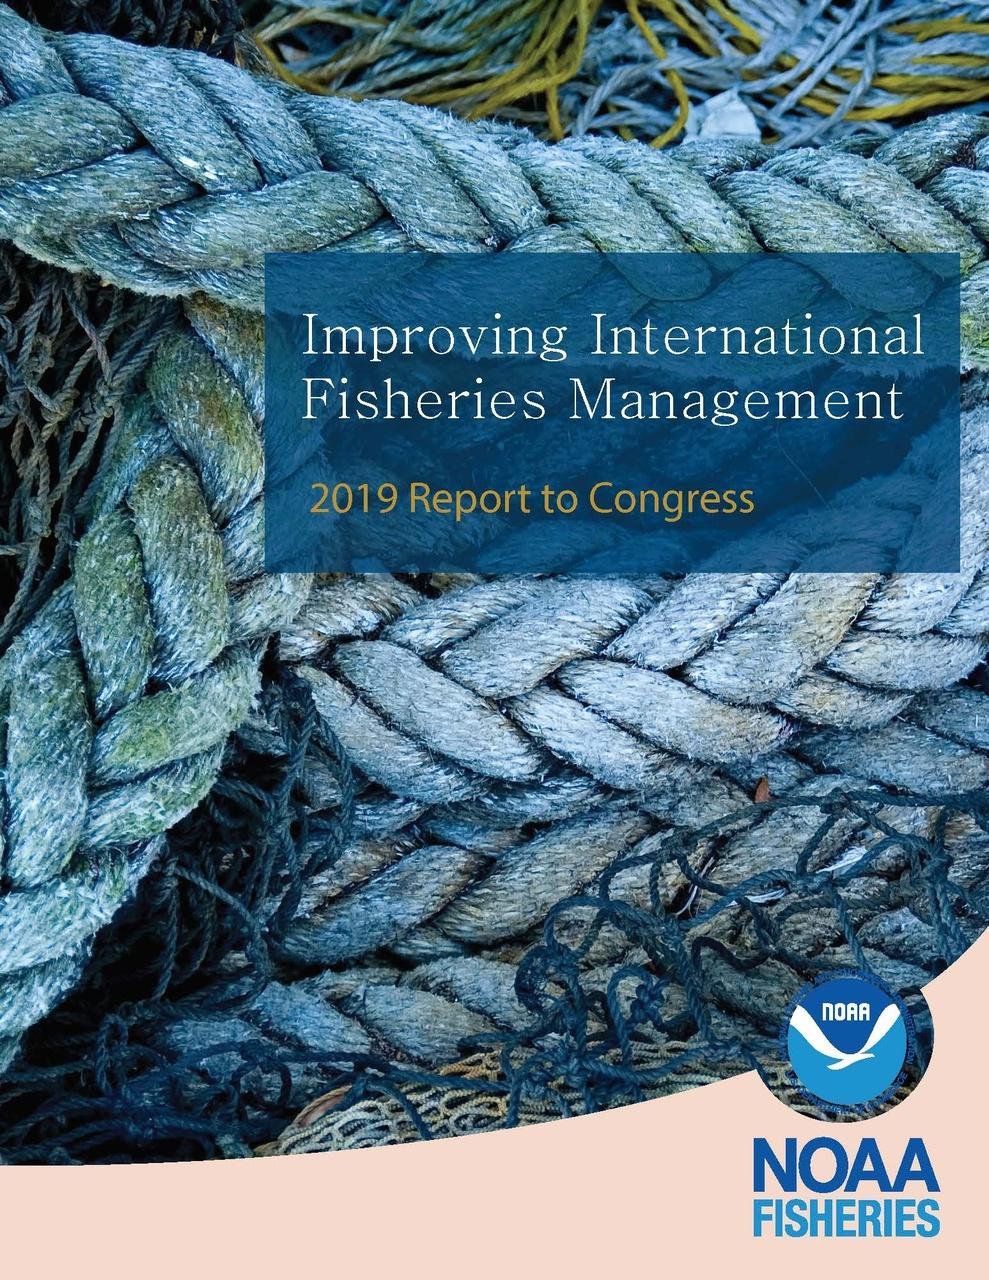 2019 Biennial IUU Report Cover final.jpg